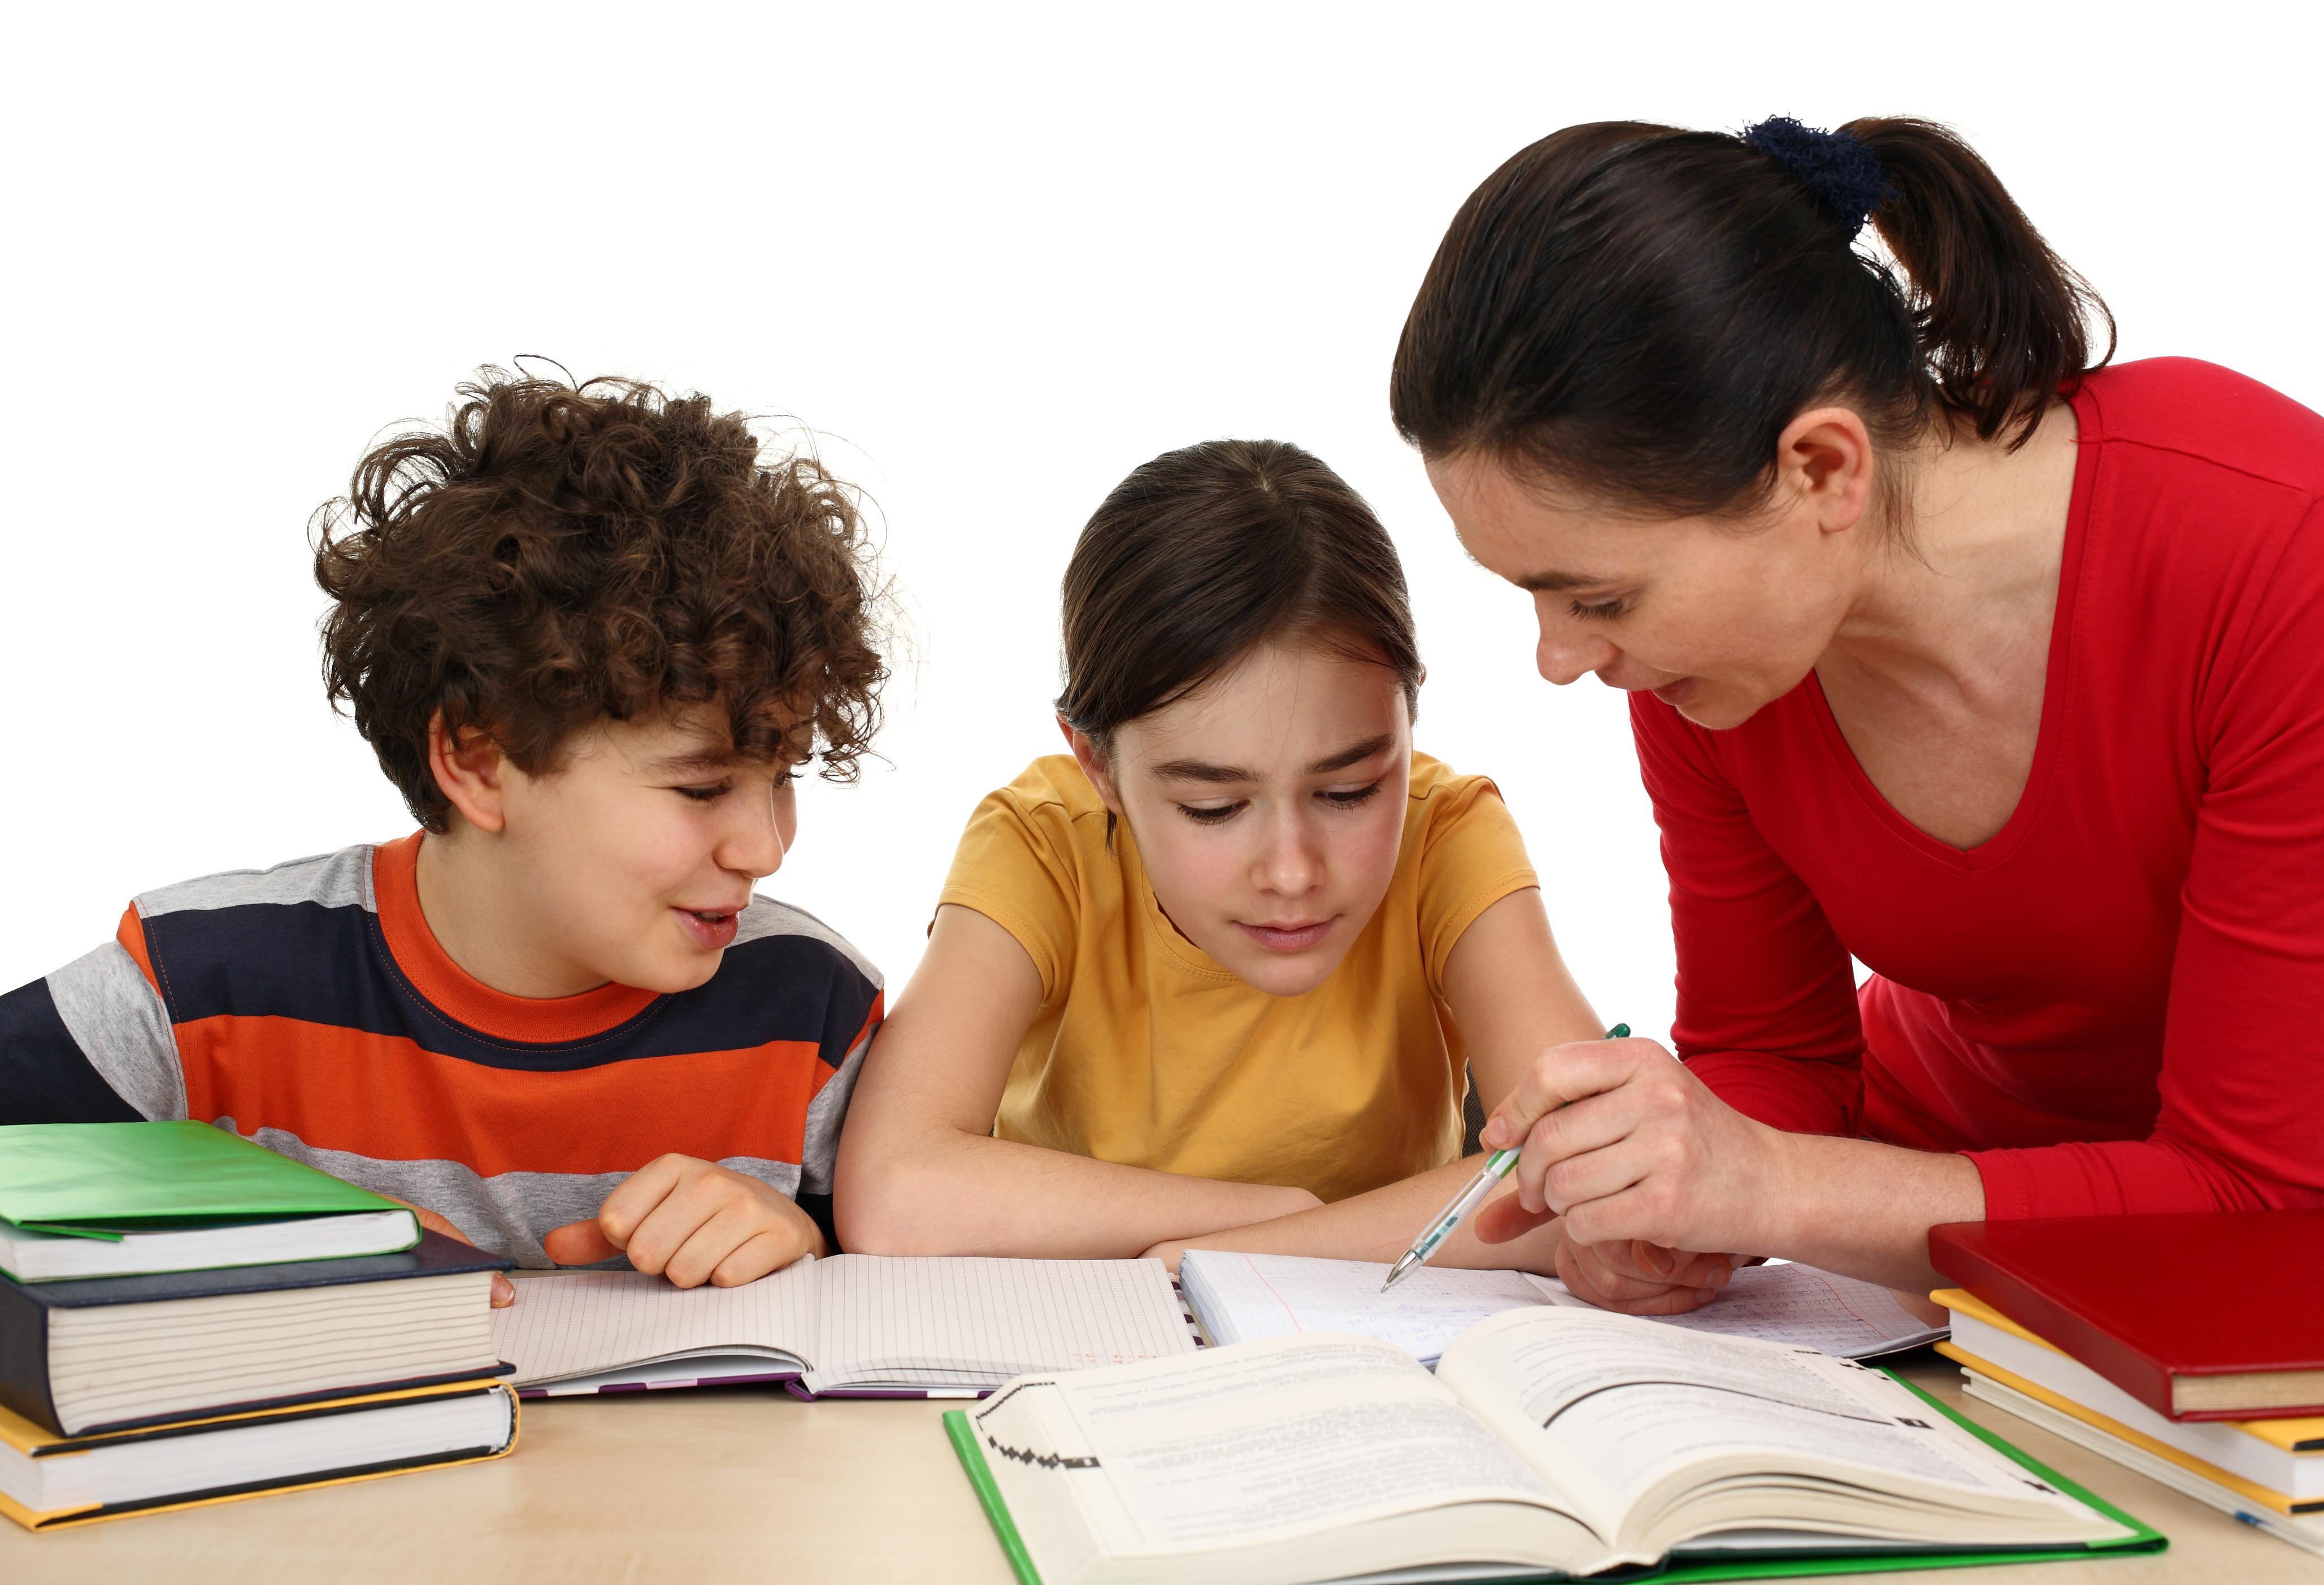 Kids doing homework isolated on white background